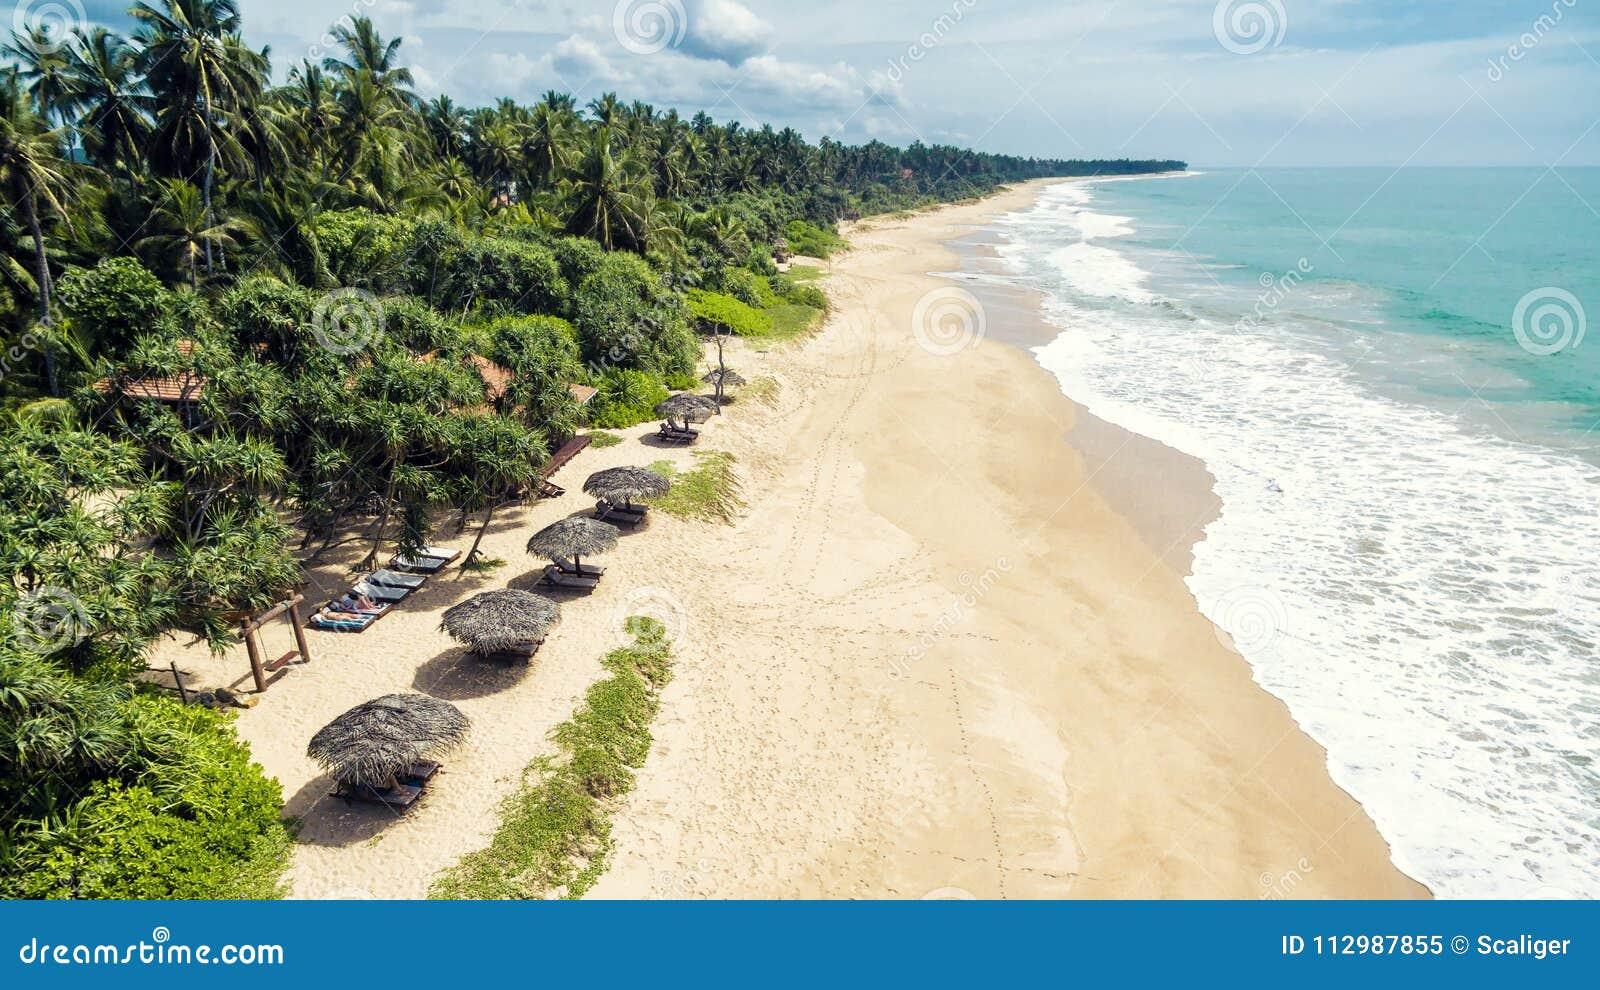 Aerial panoramic view of the tropical long beach, Sri Lanka